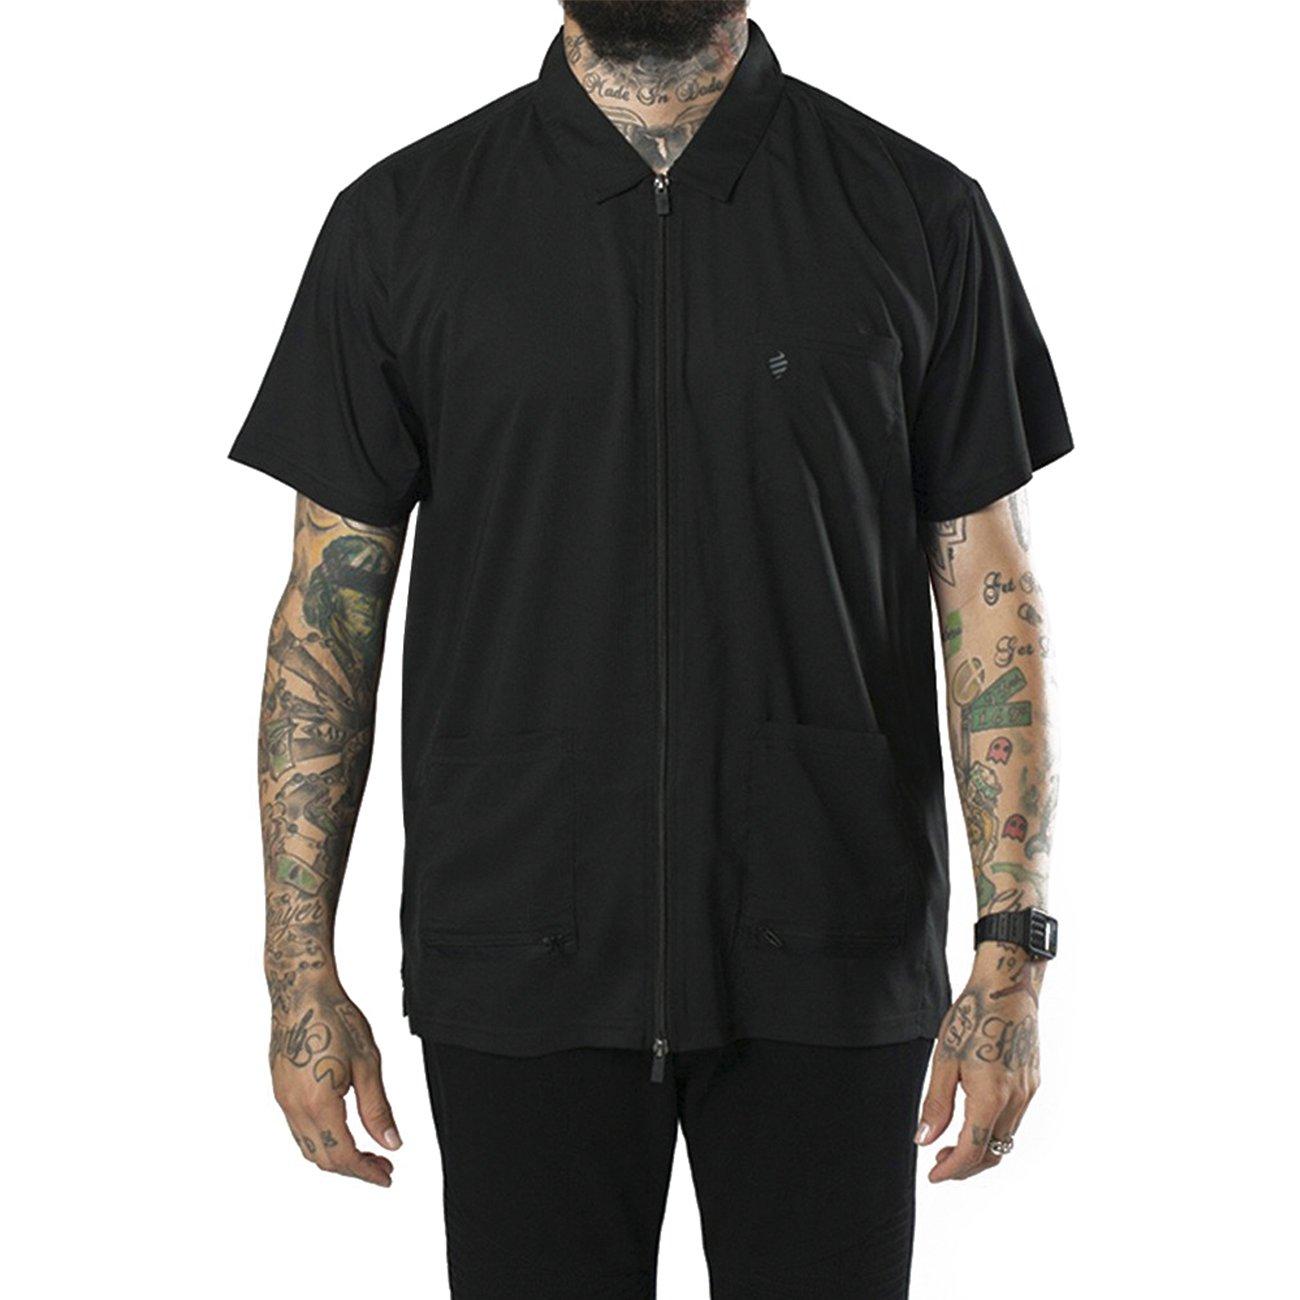 Barber Strong Jacket, Black, Large by Barber Strong